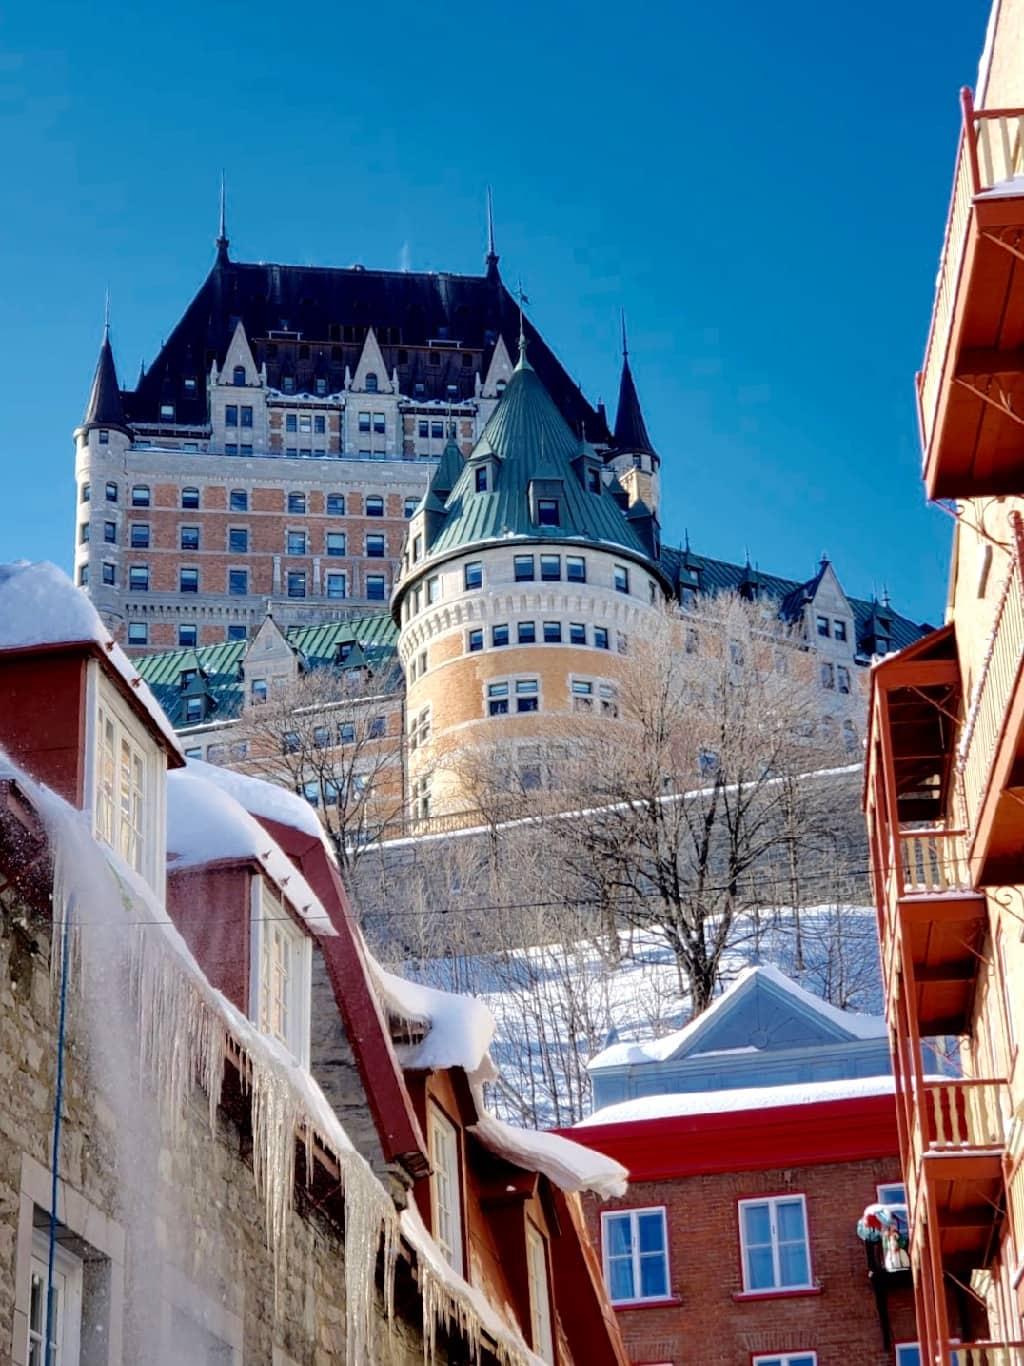 #QuebecCity, #CanadaTravel, #FamilyTravel